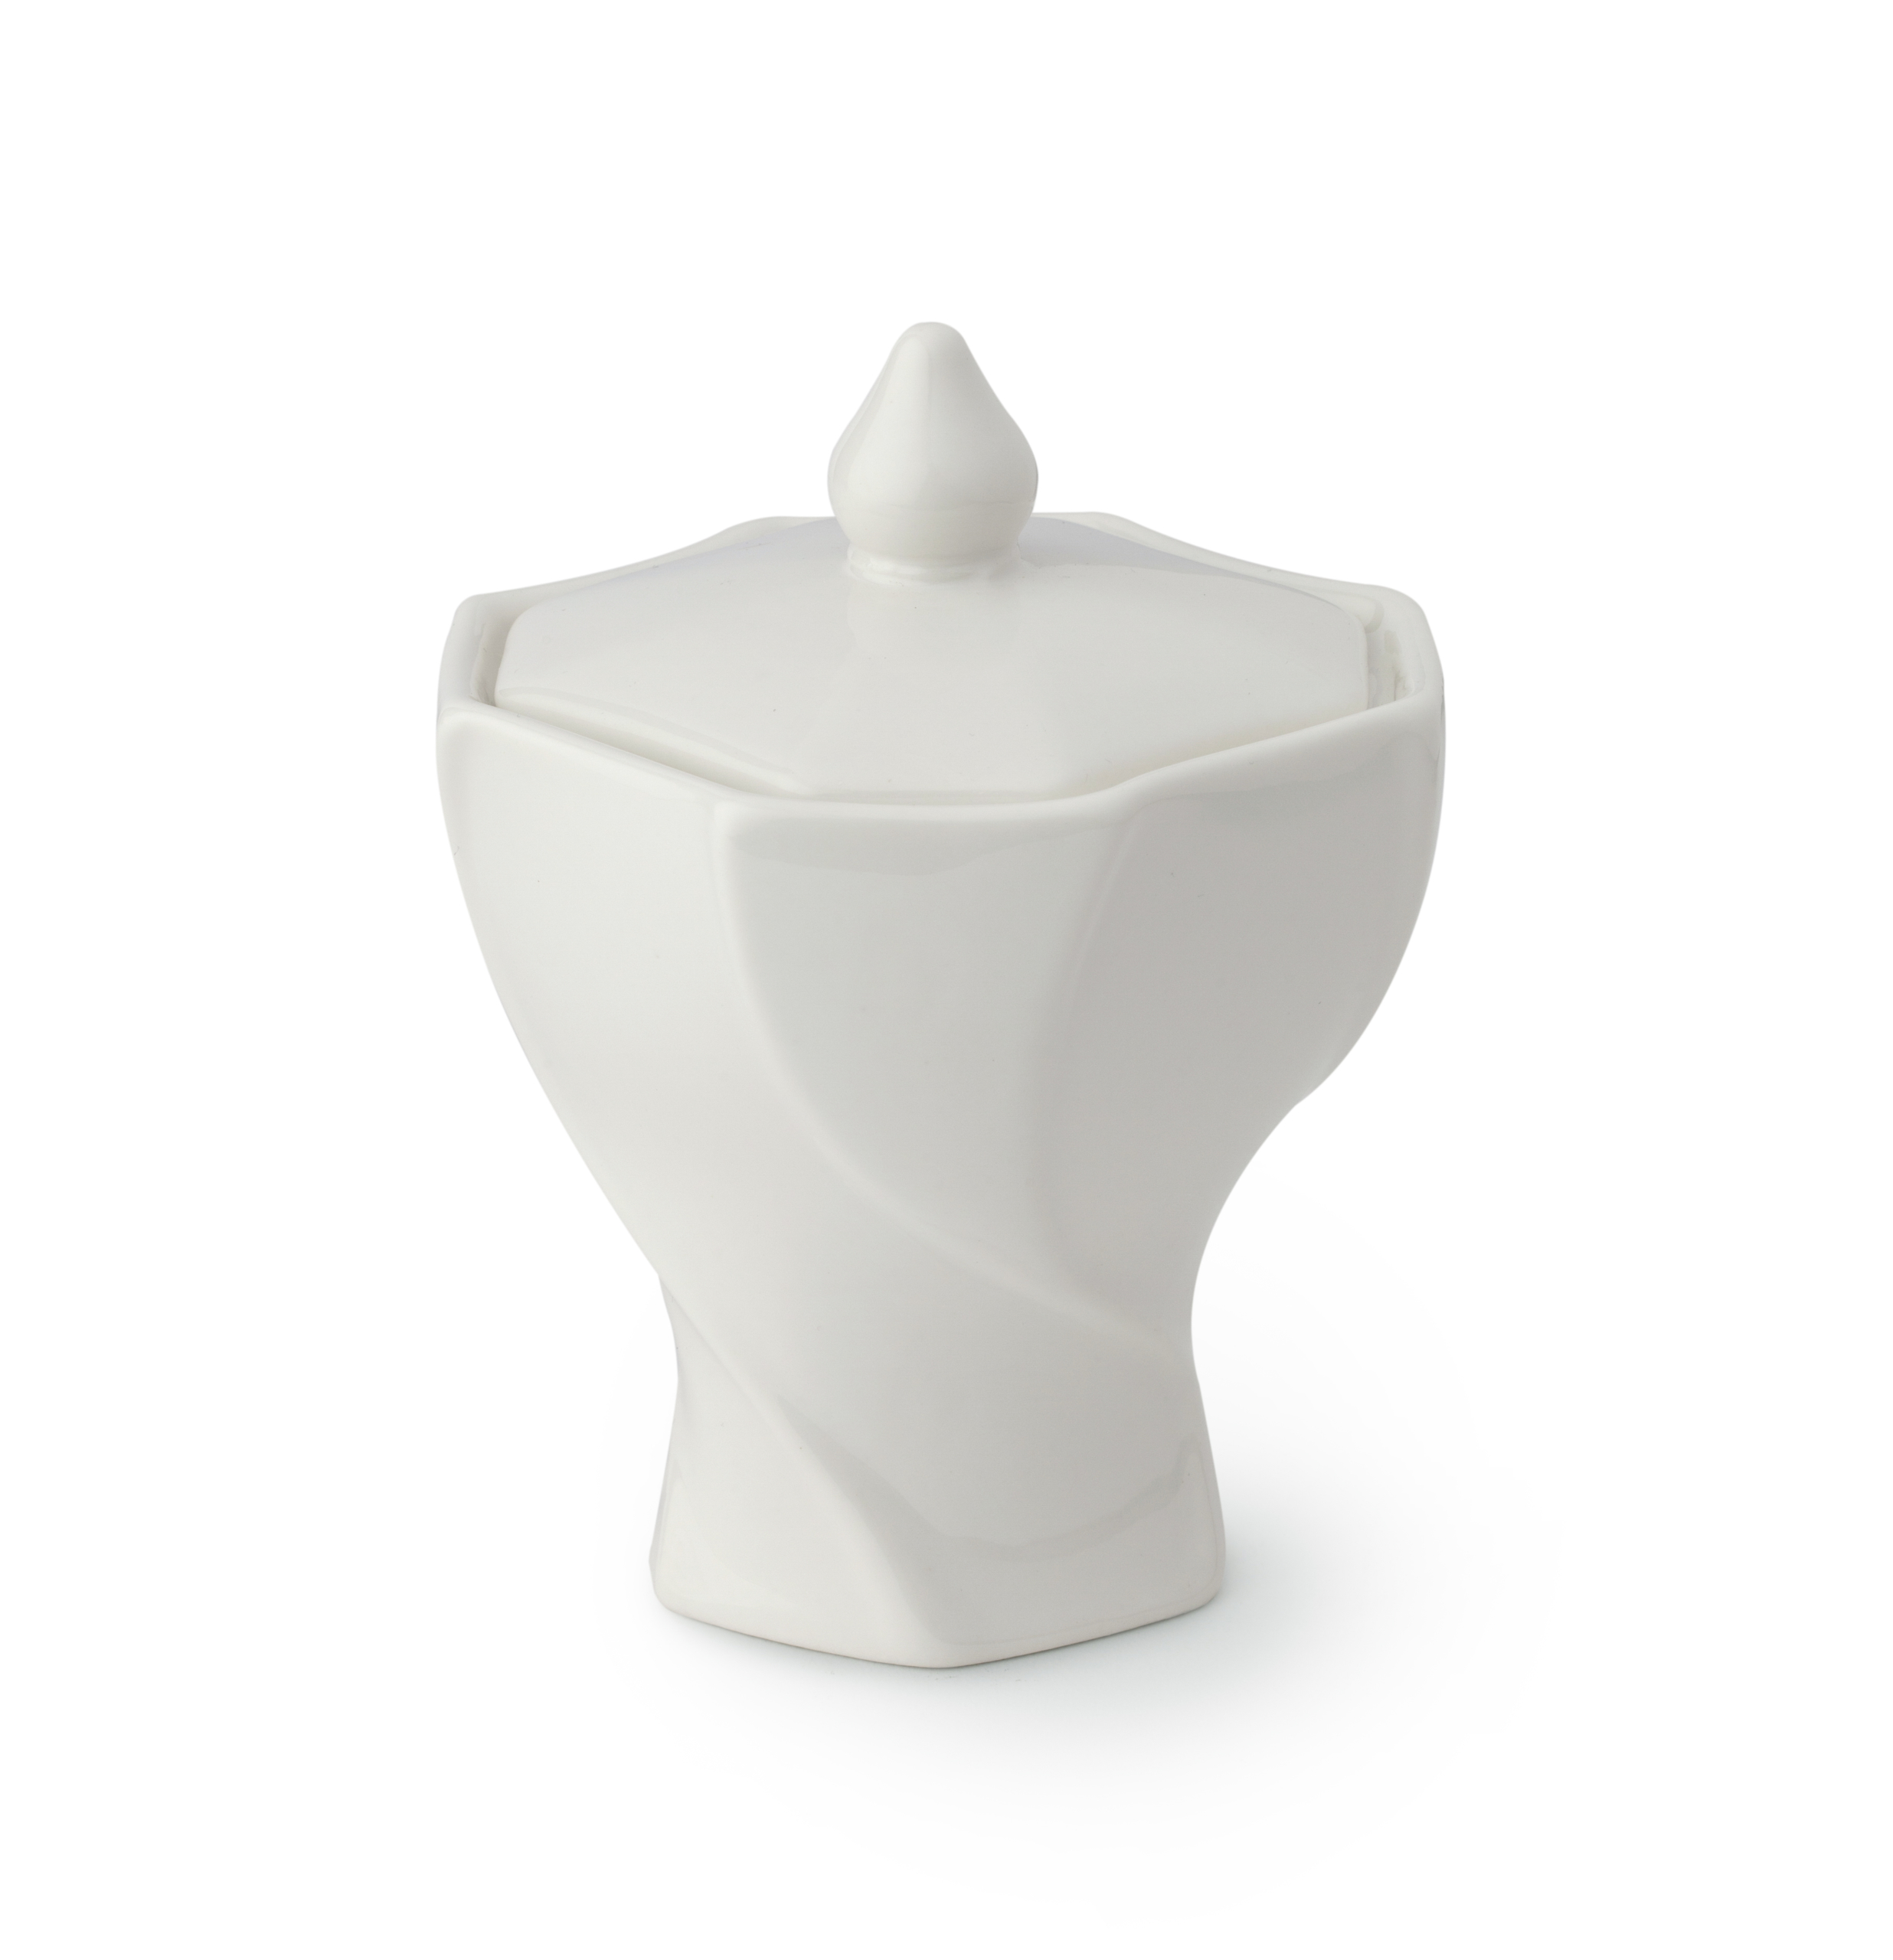 Contenitore porcellana bianca